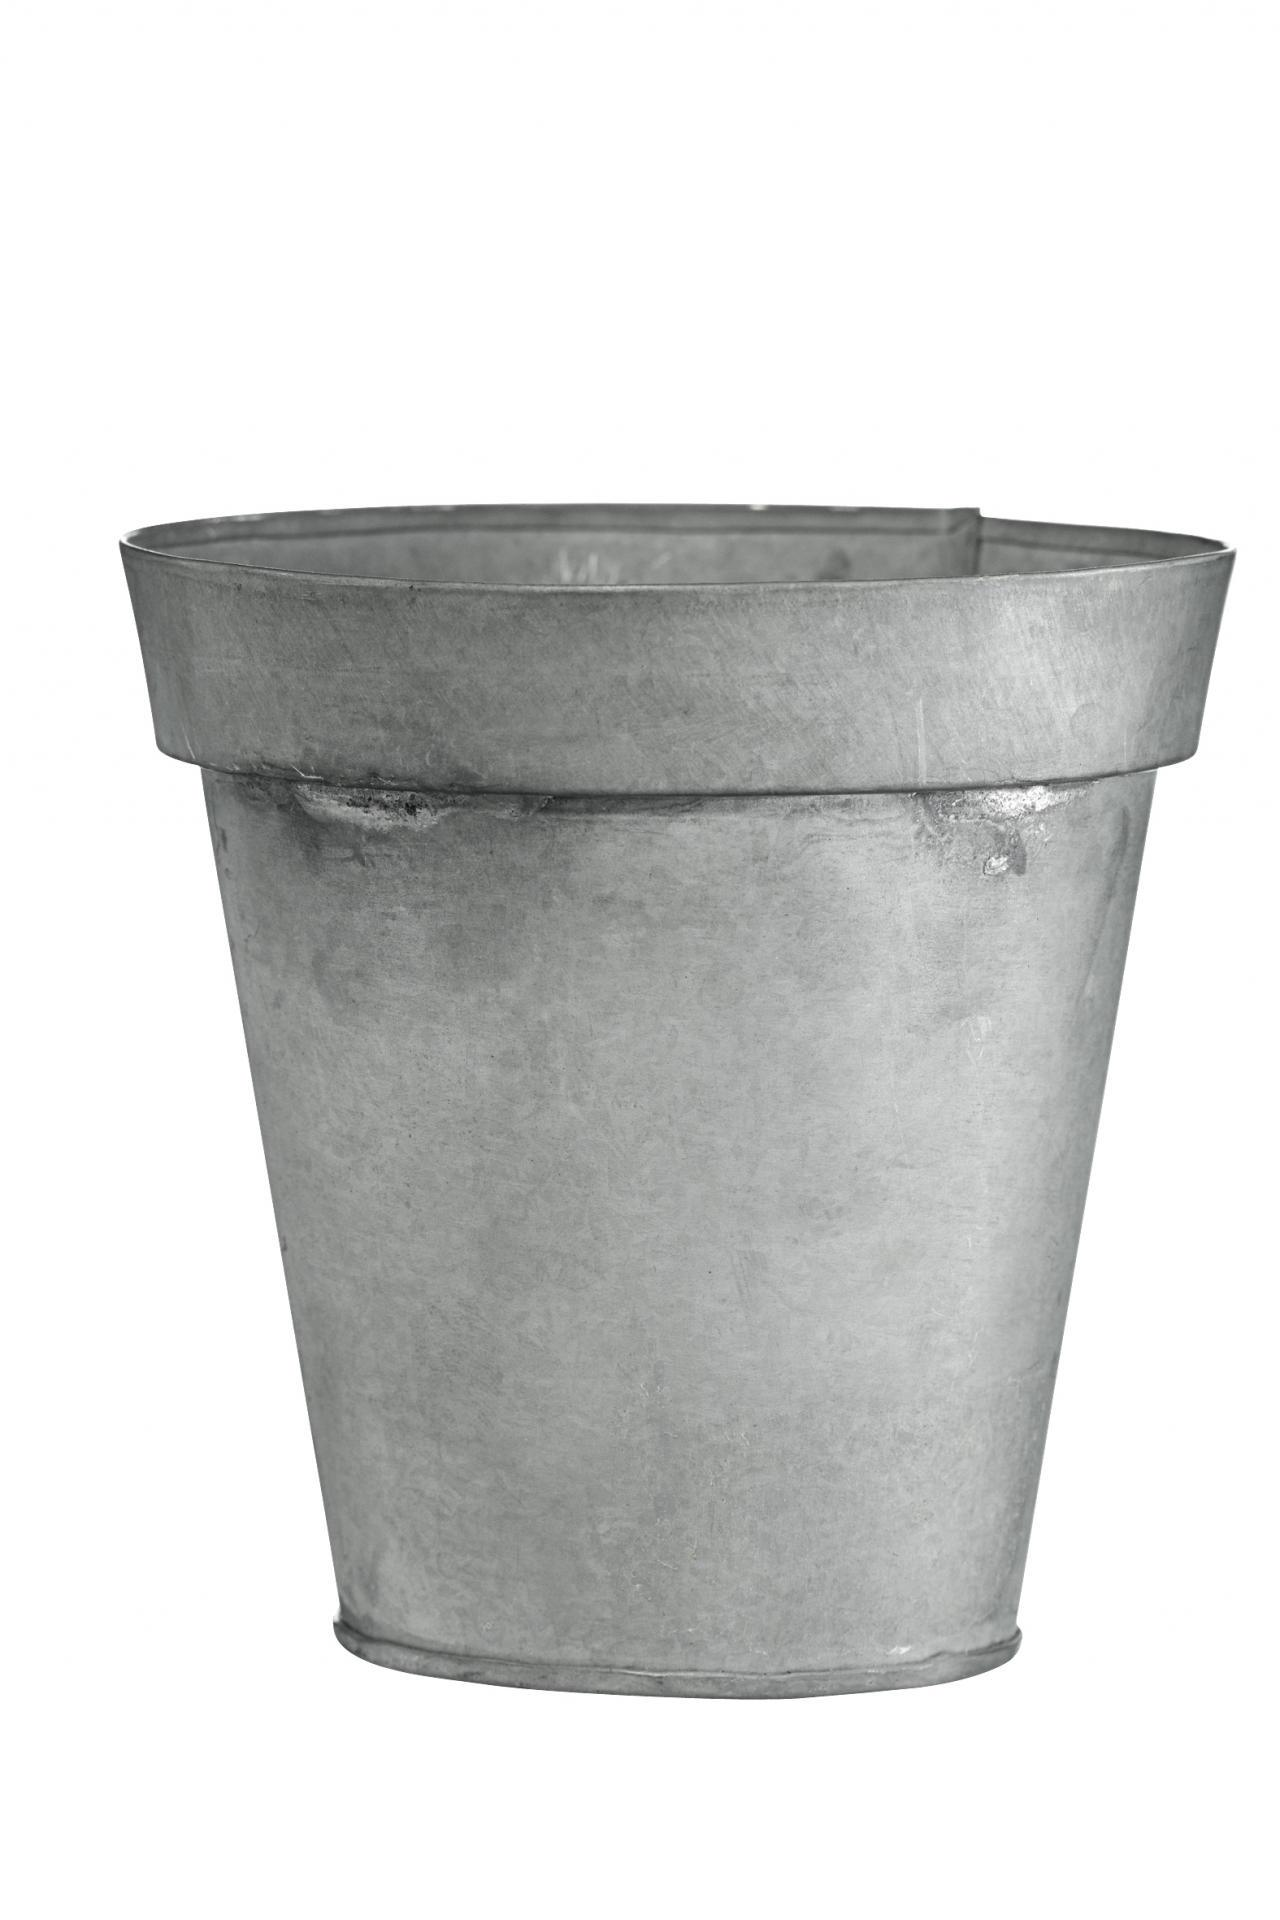 MADAM STOLTZ Obal na květiny Round Zinc, šedá barva, zinek